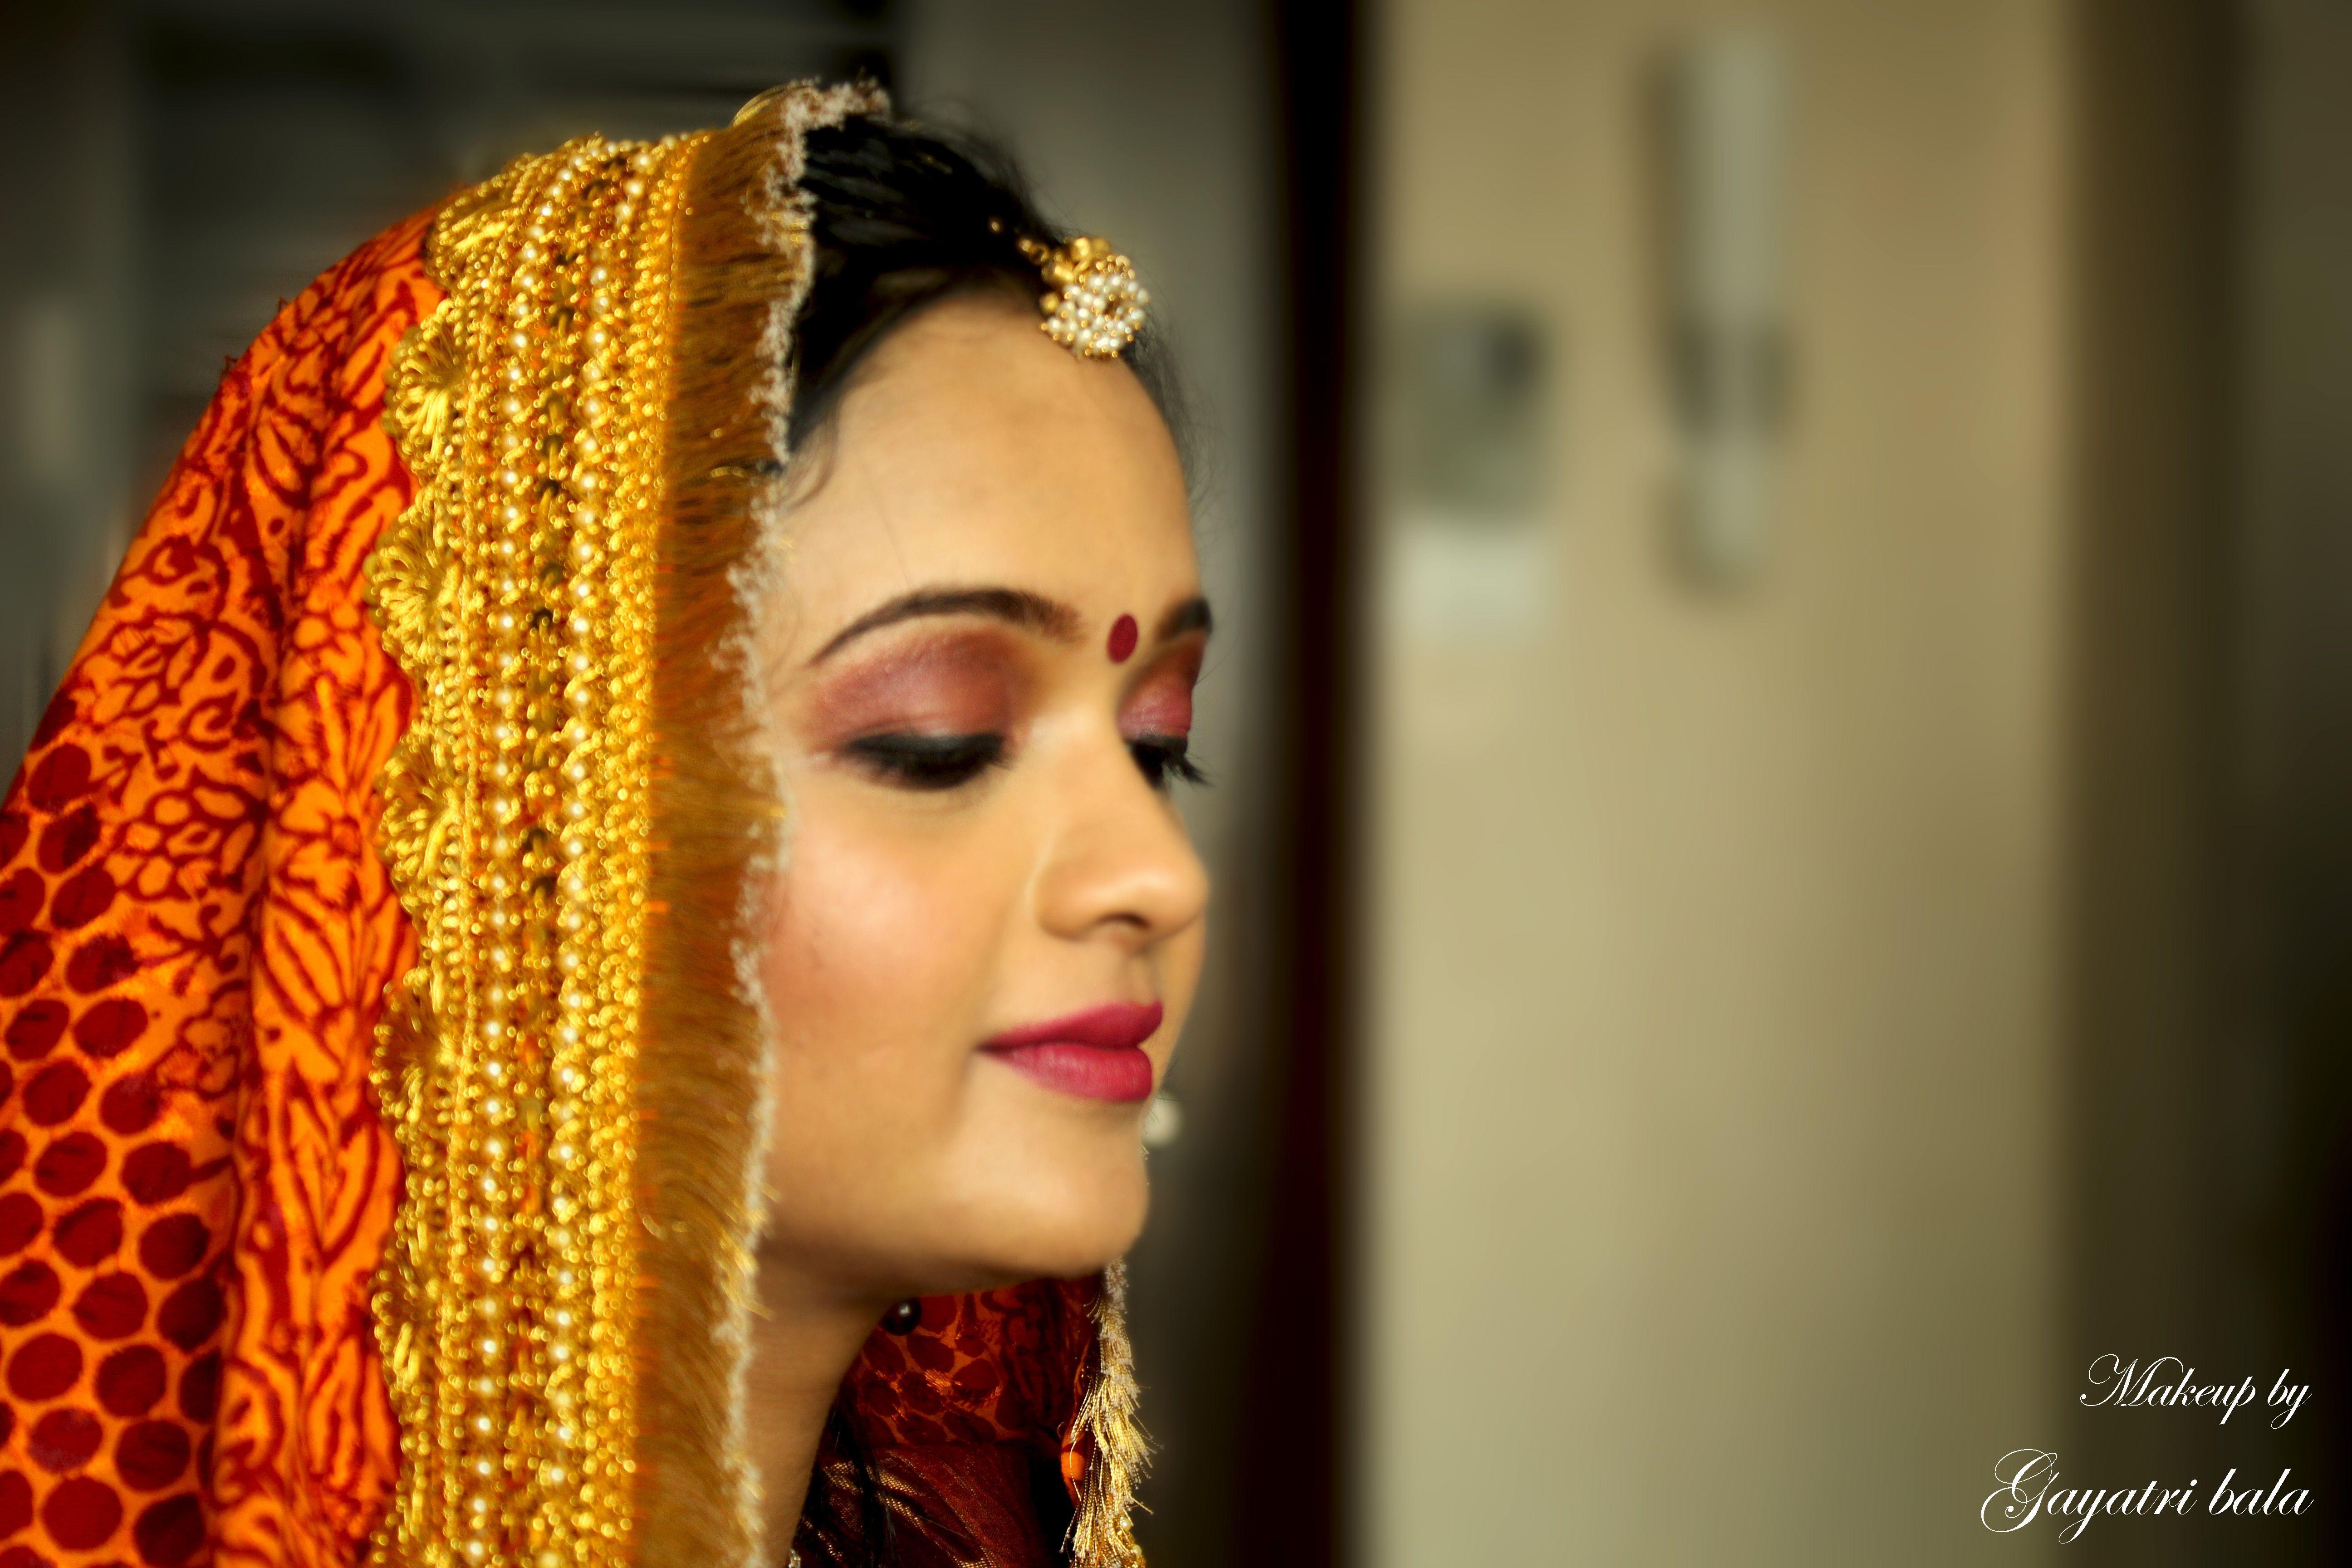 North Bridal Makeup Pictures : north indian bridal...kumauni bride... Makeup By Gayatri ...